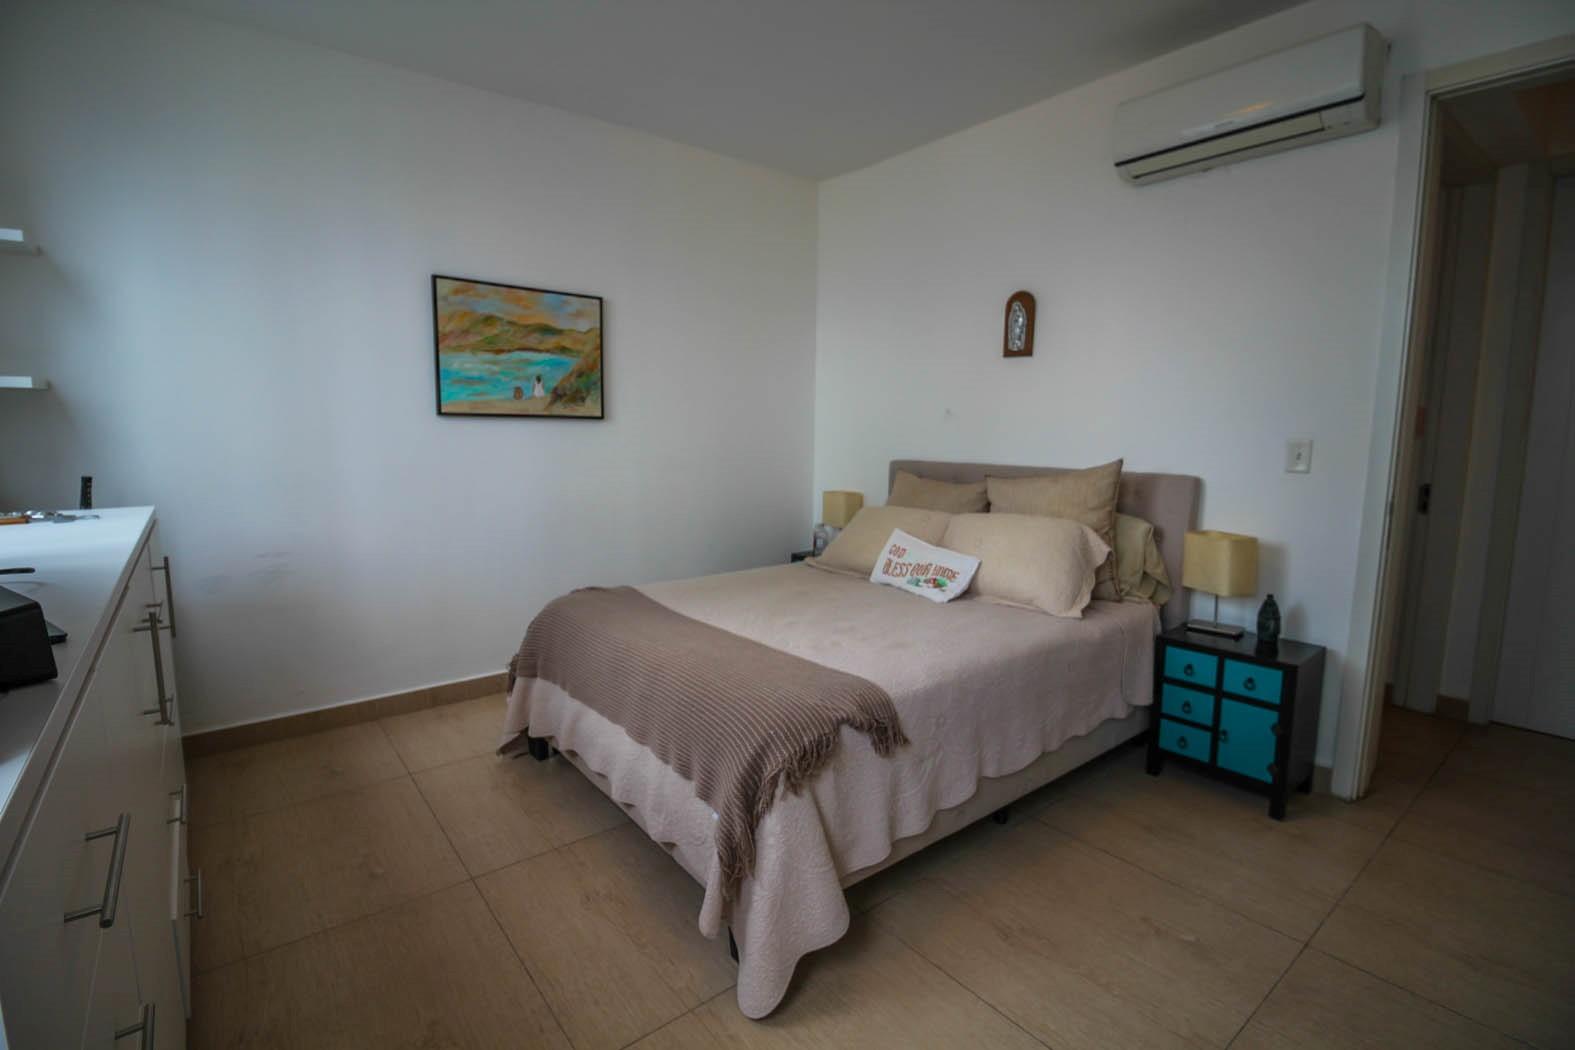 Avenida-Balboa-Panama-property-panamaequityocean-city-views-2nd-line-balboa-ave-11.jpg